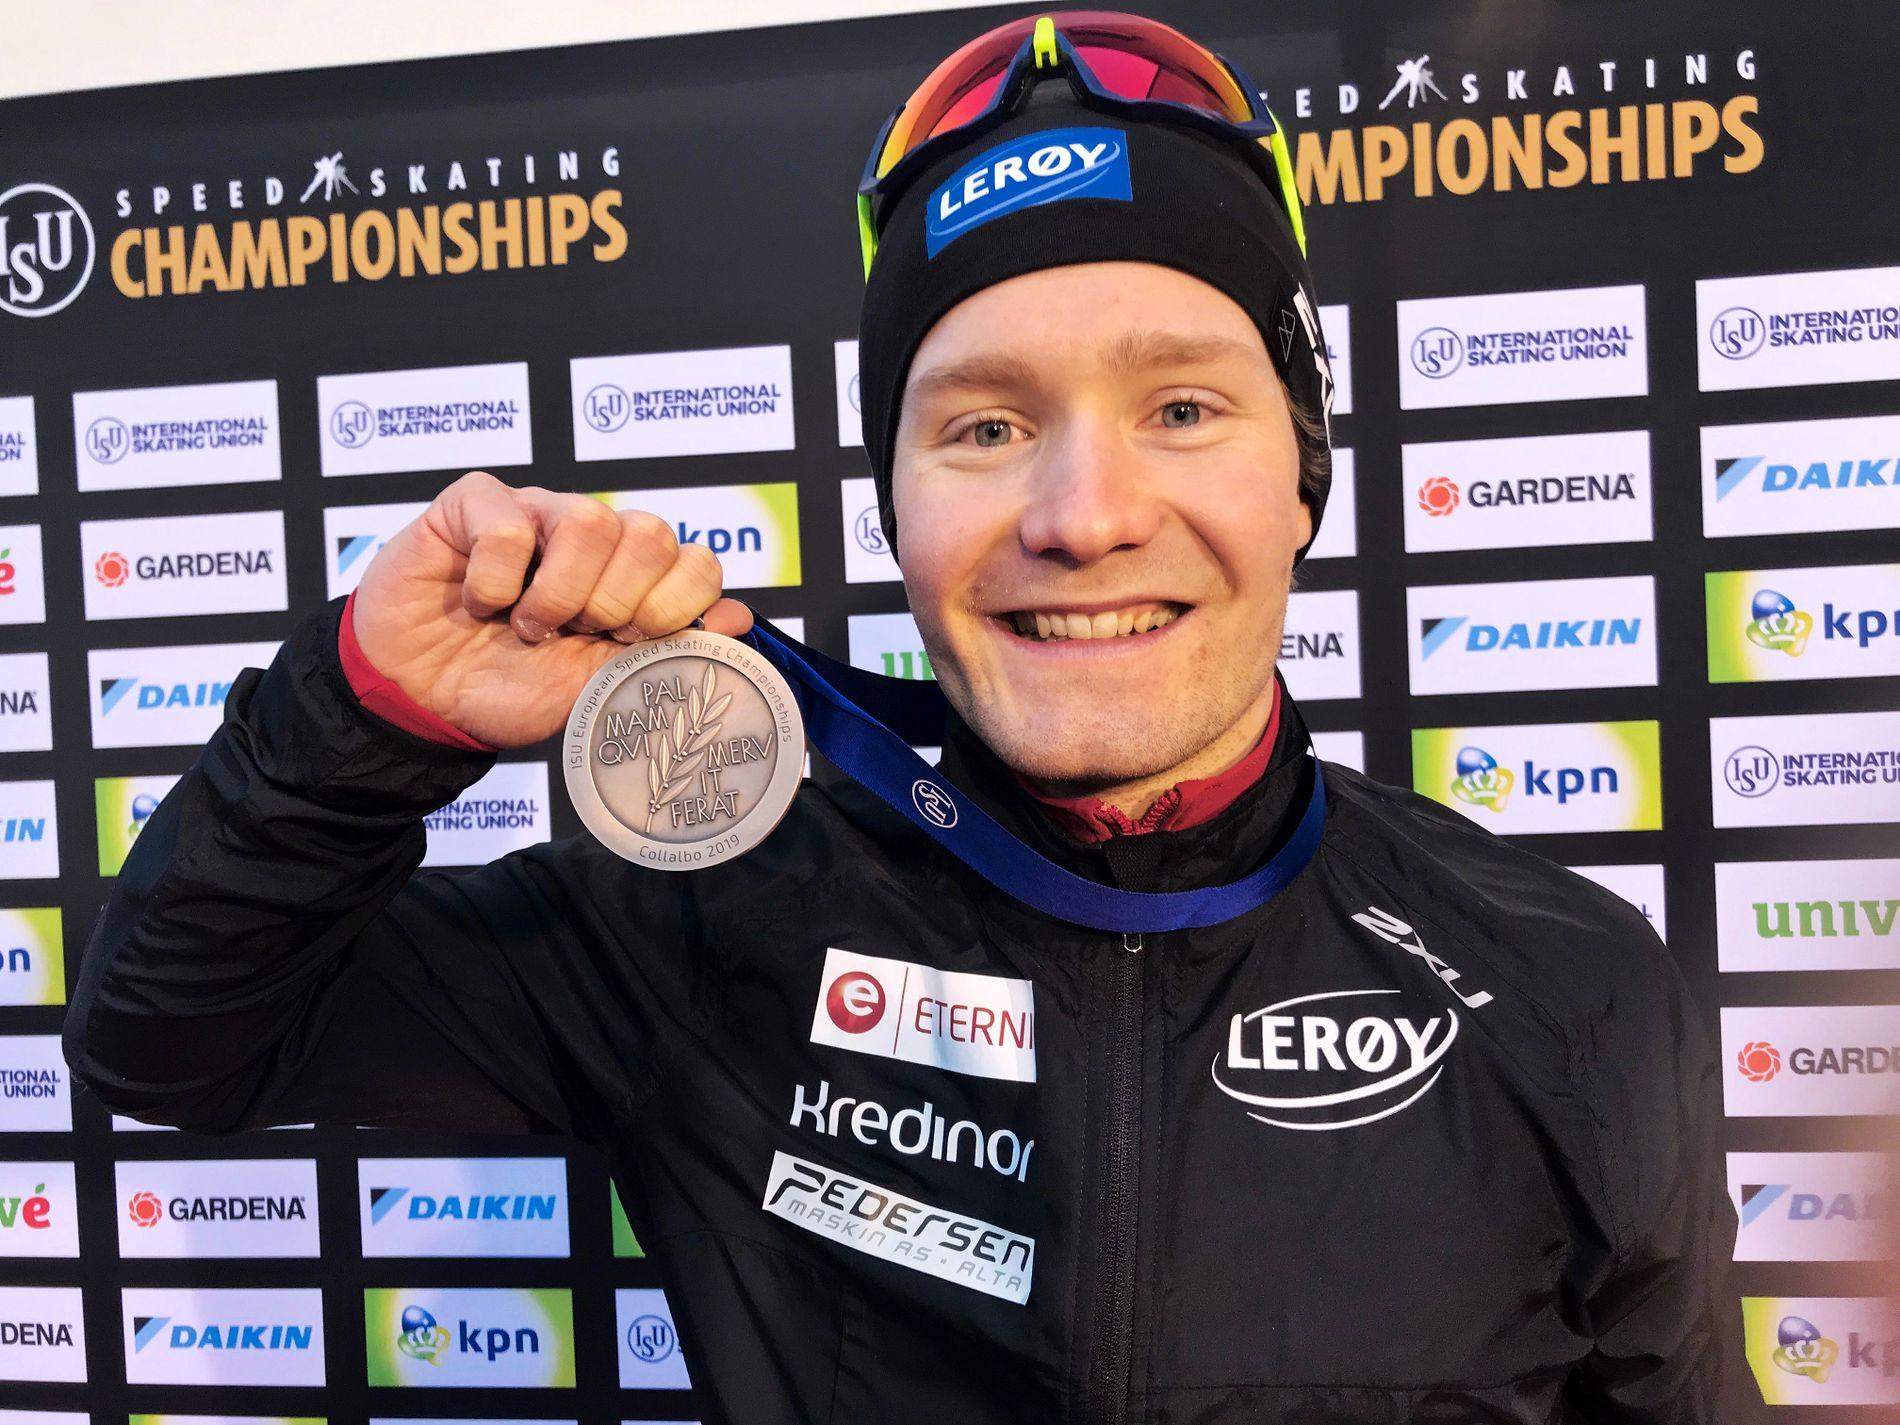 HISTORISK MEDALJE: Sverre Lunde Pedersen (26) har aldri tidligere vunnet en medalje i allround-EM. I allround-VM har han tre.